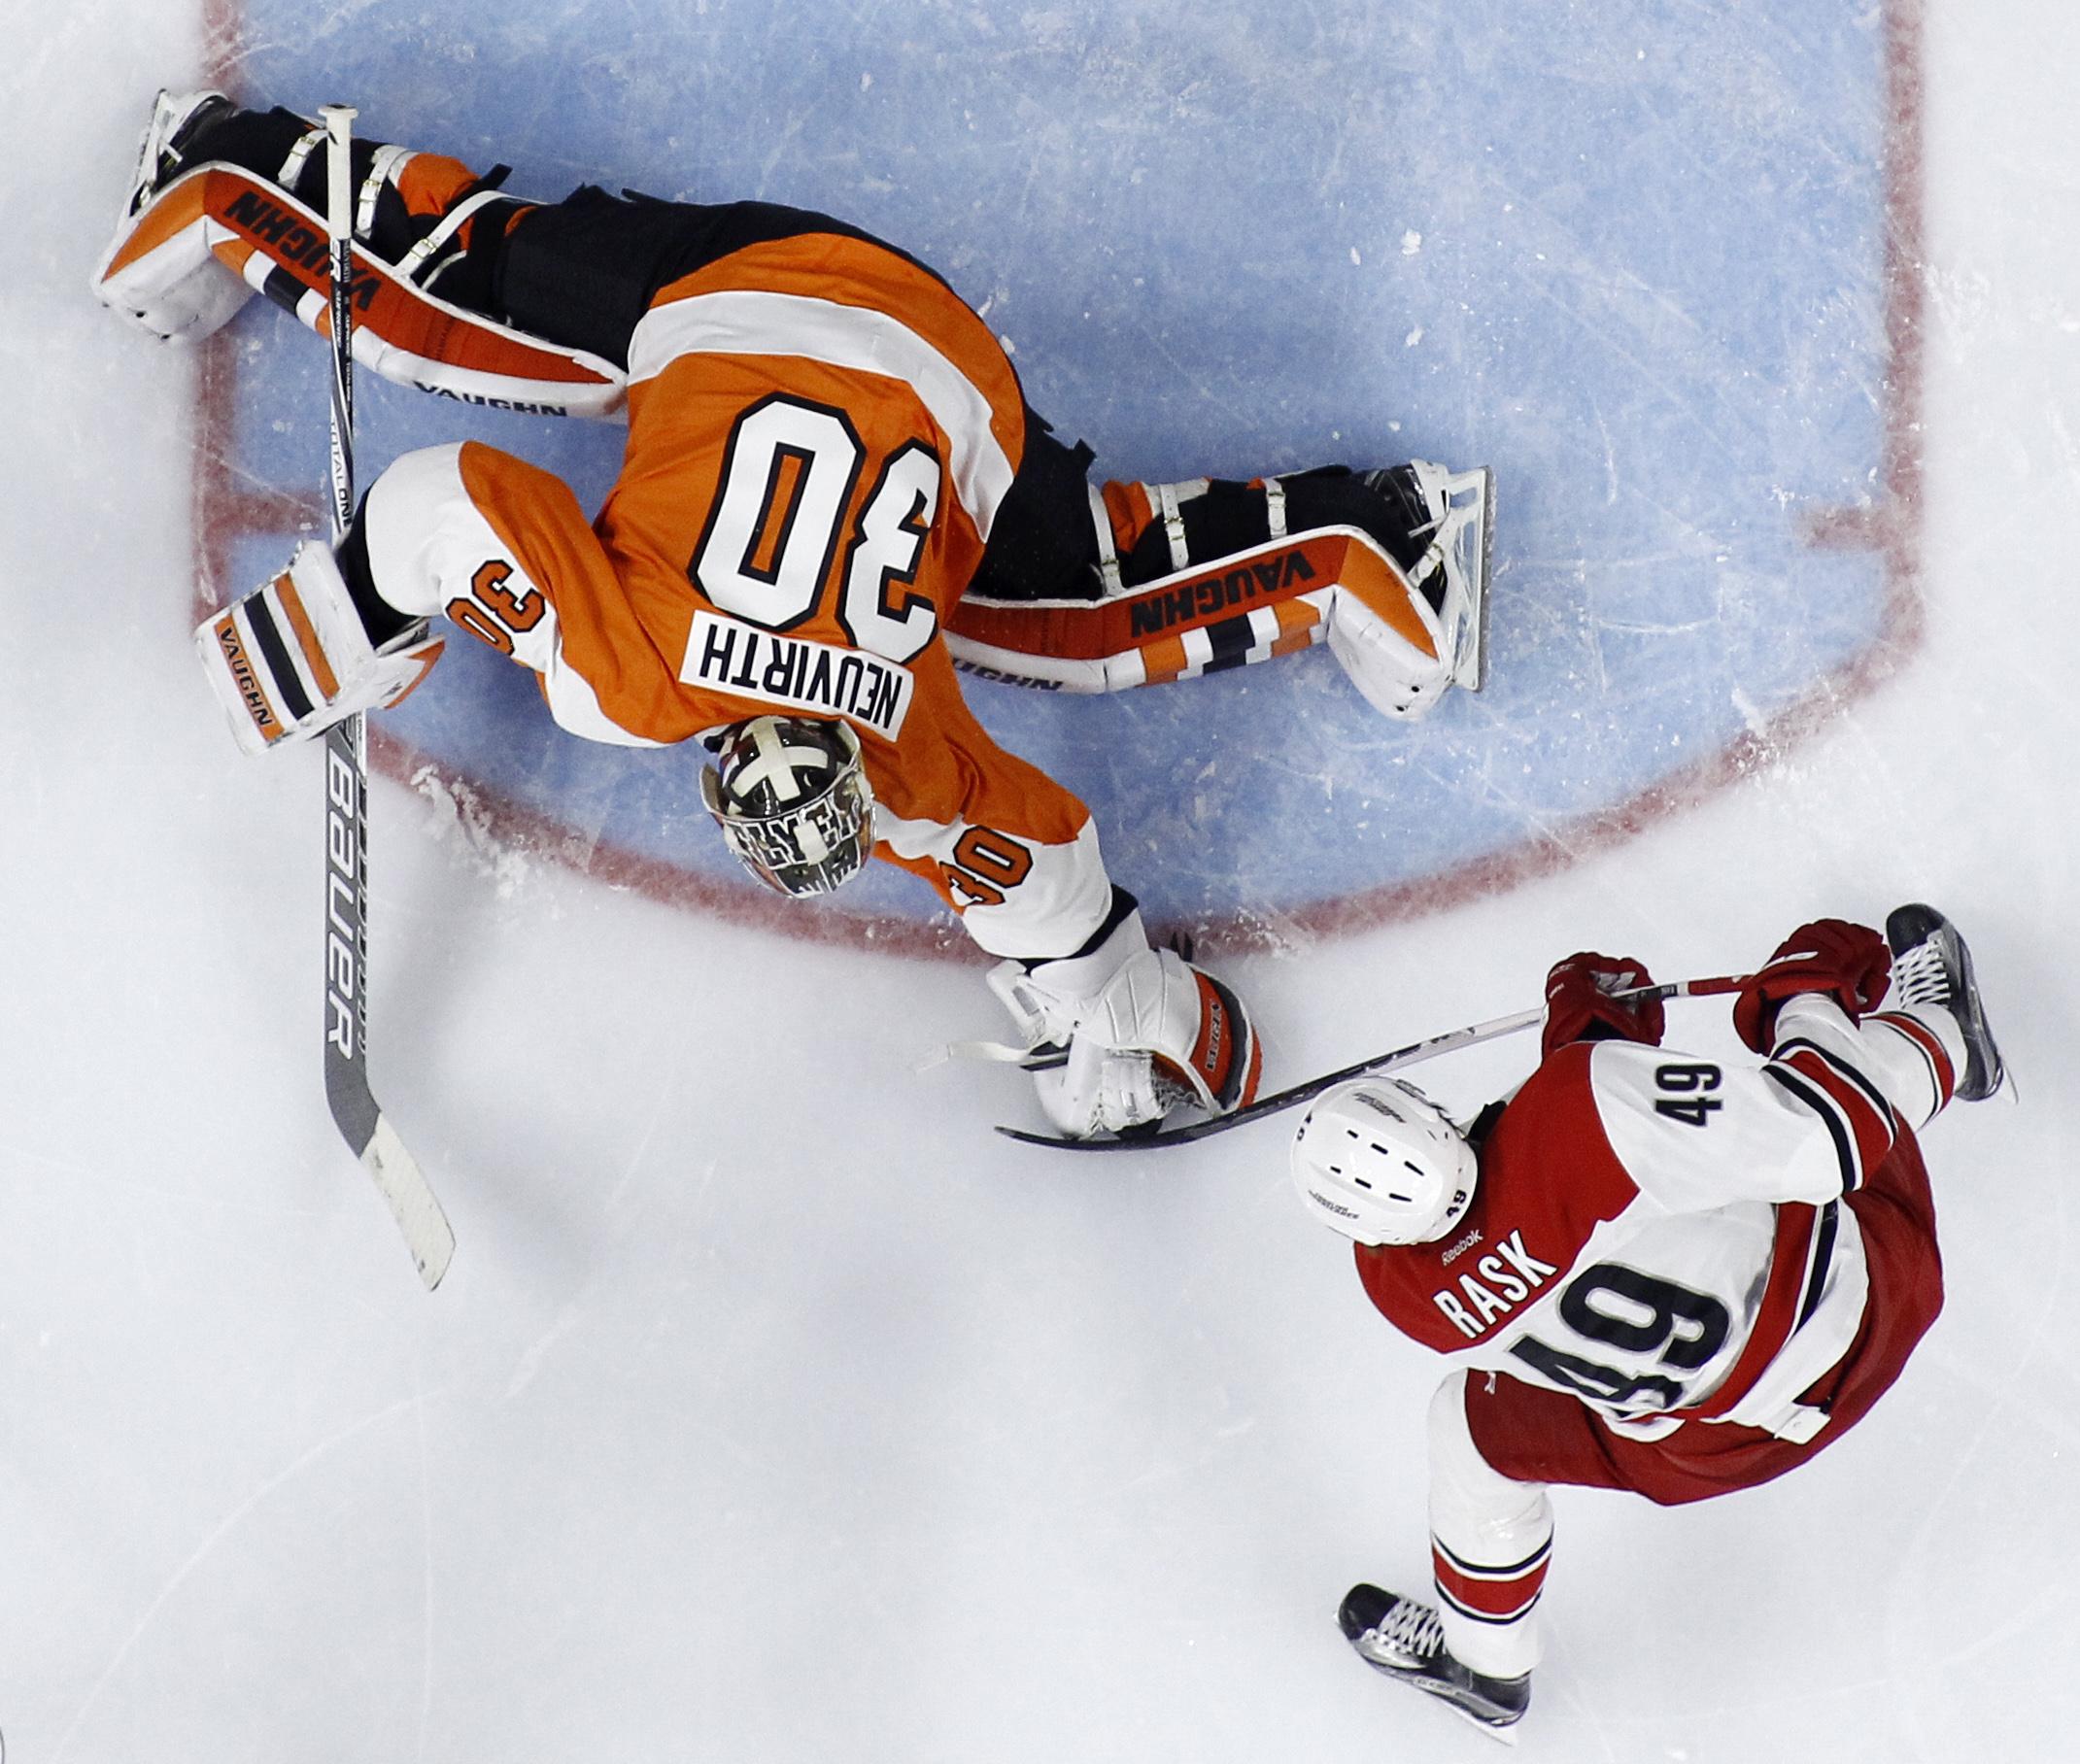 Philadelphia Flyers' Michal Neuvirth (30) blocks a shot by Carolina Hurricanes' Victor Rask (49) during the third period of an NHL hockey game Tuesday, Dec. 15, 2015, in Philadelphia. Philadelphia won 4-3 in overtime. (AP Photo/Matt Slocum)